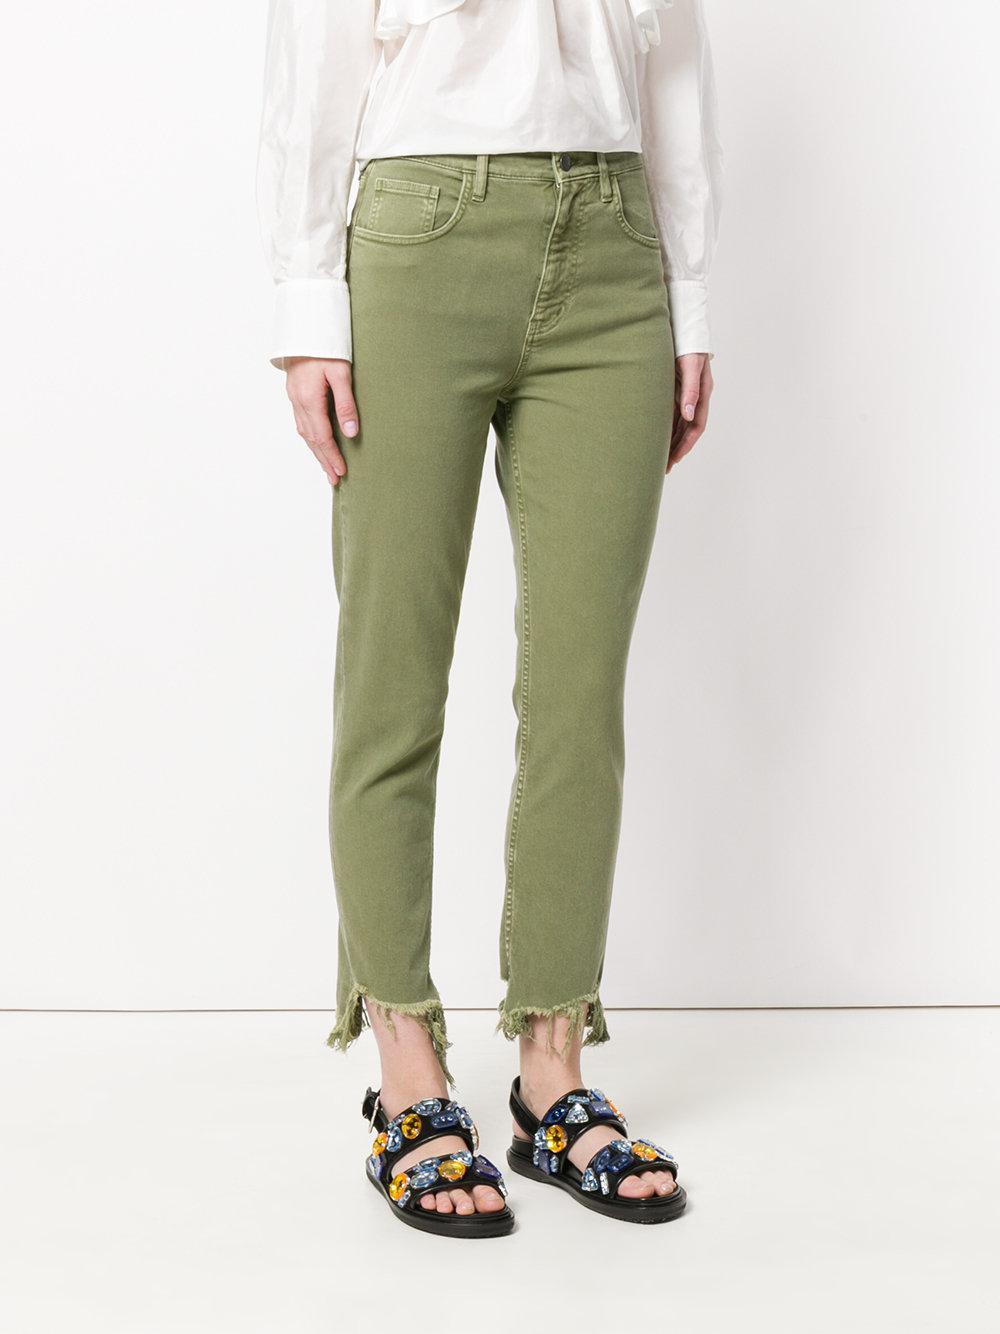 Mih Jeans Mimi High Rise Vintage Slim Jean with Raw Hem - Nova green Mih Jeans BUUZtV